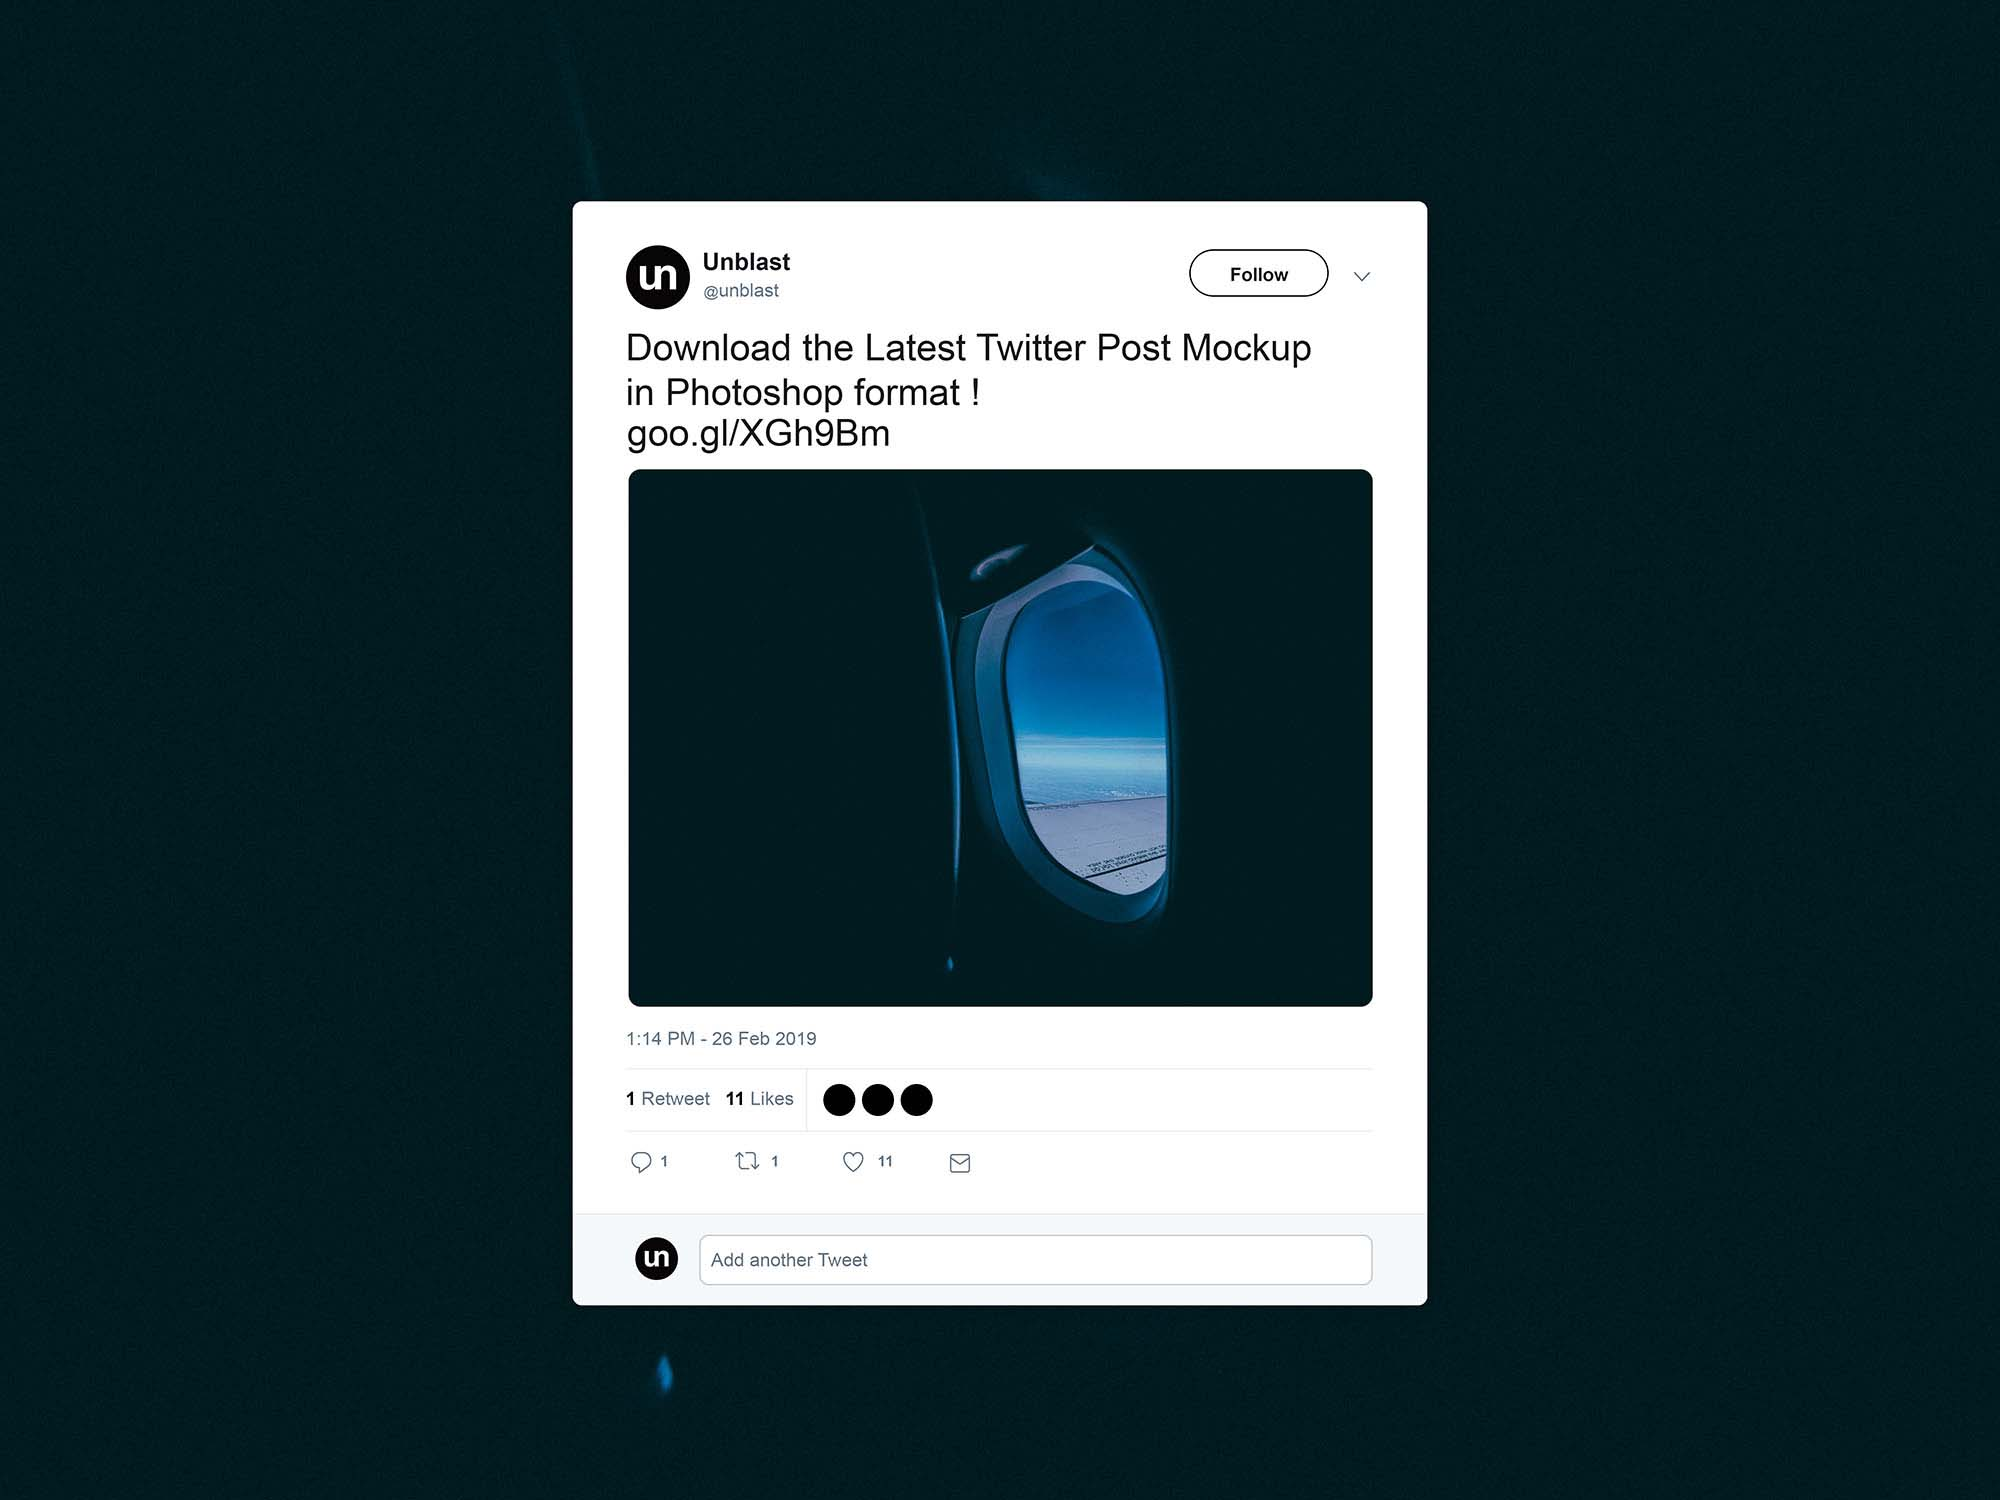 Free Twitter Post Mockup (2019)